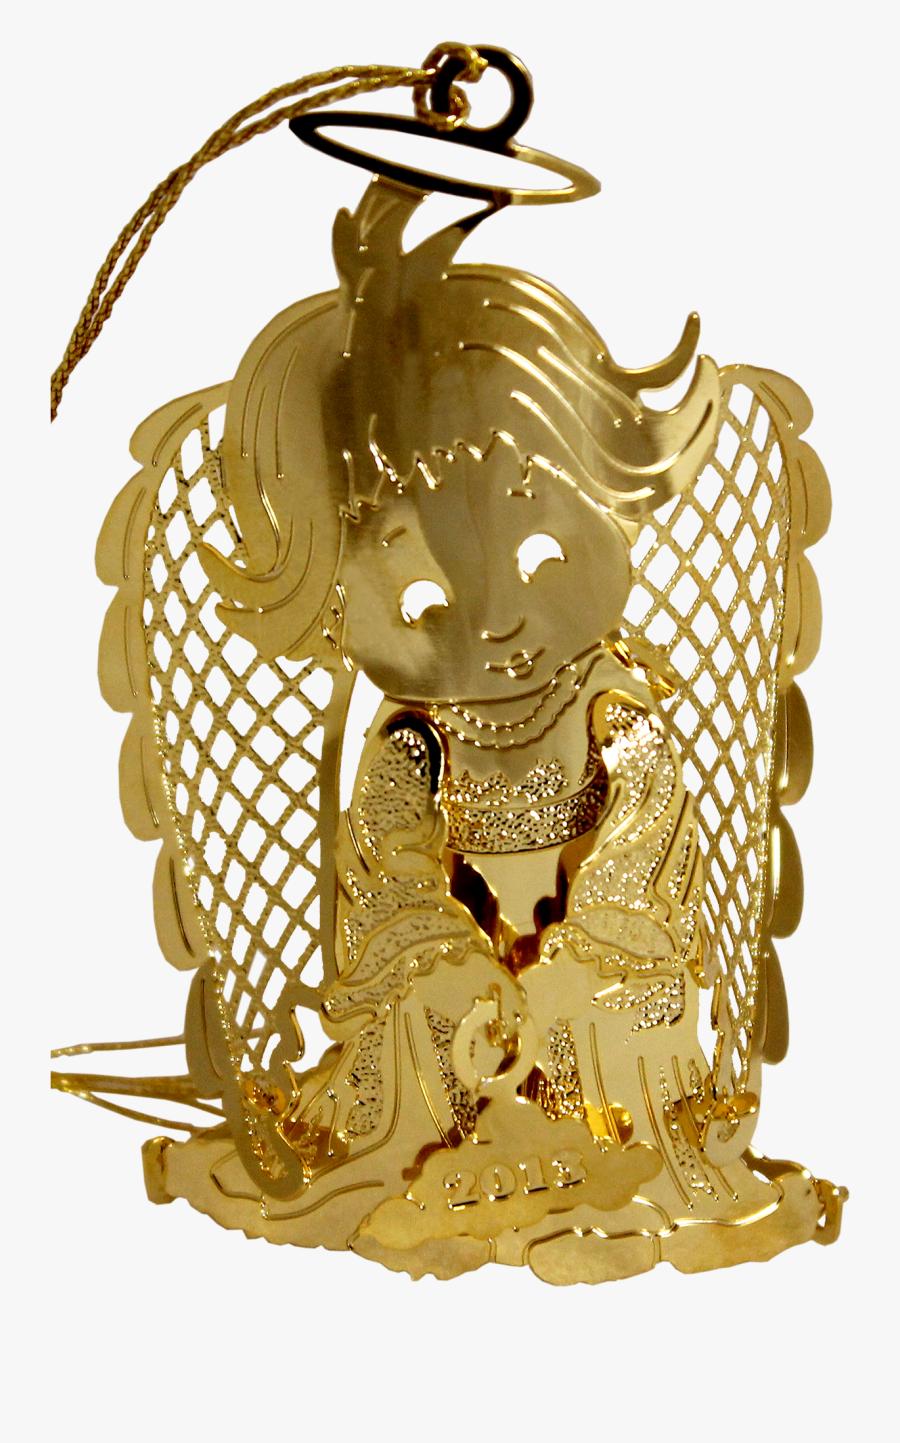 Brass Clip Acorn - Fictional Character, Transparent Clipart